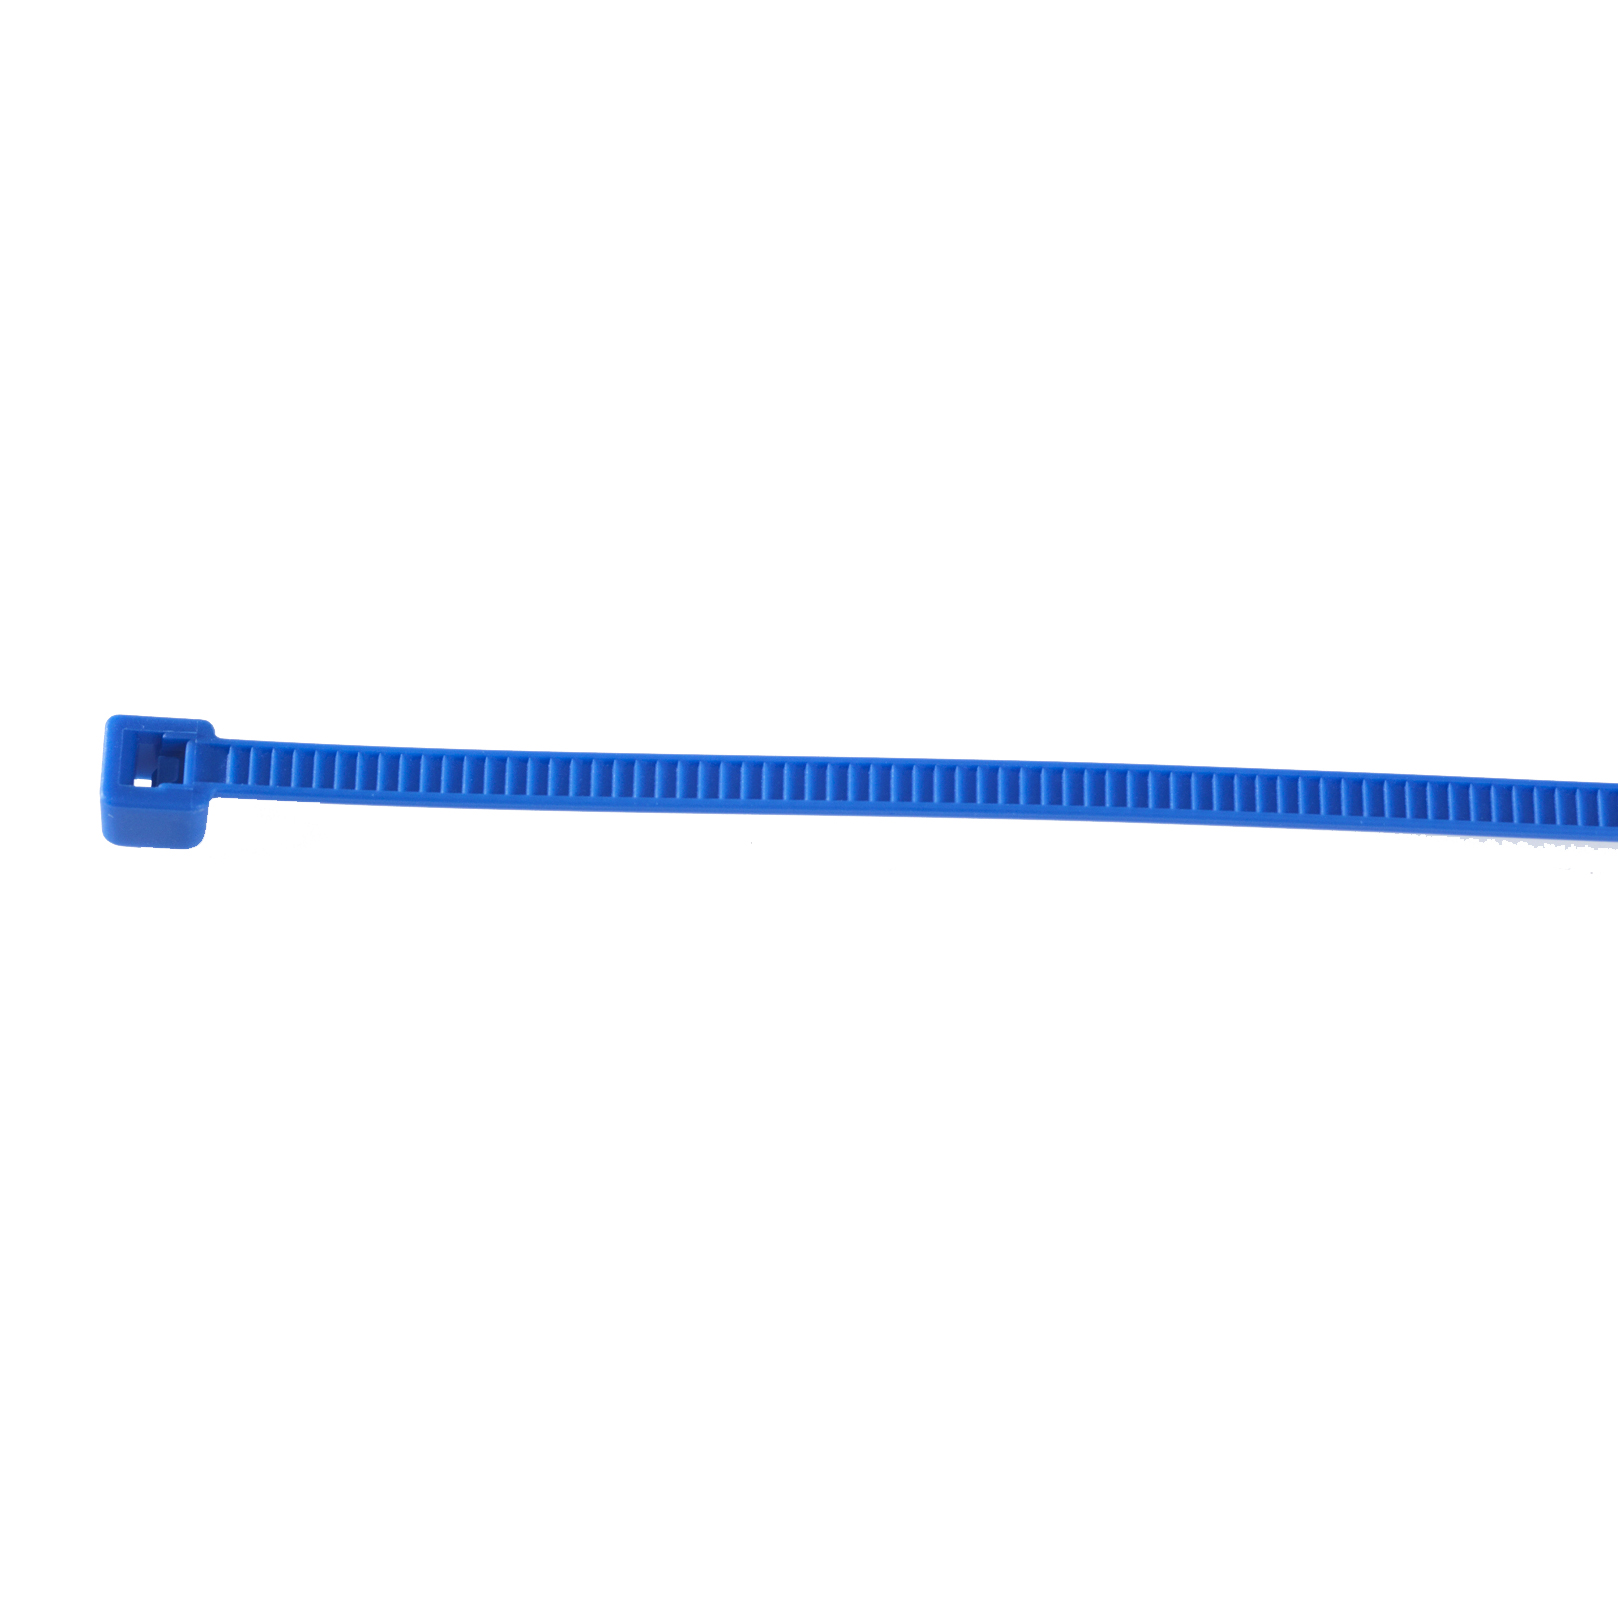 Blue Cable Tie Image